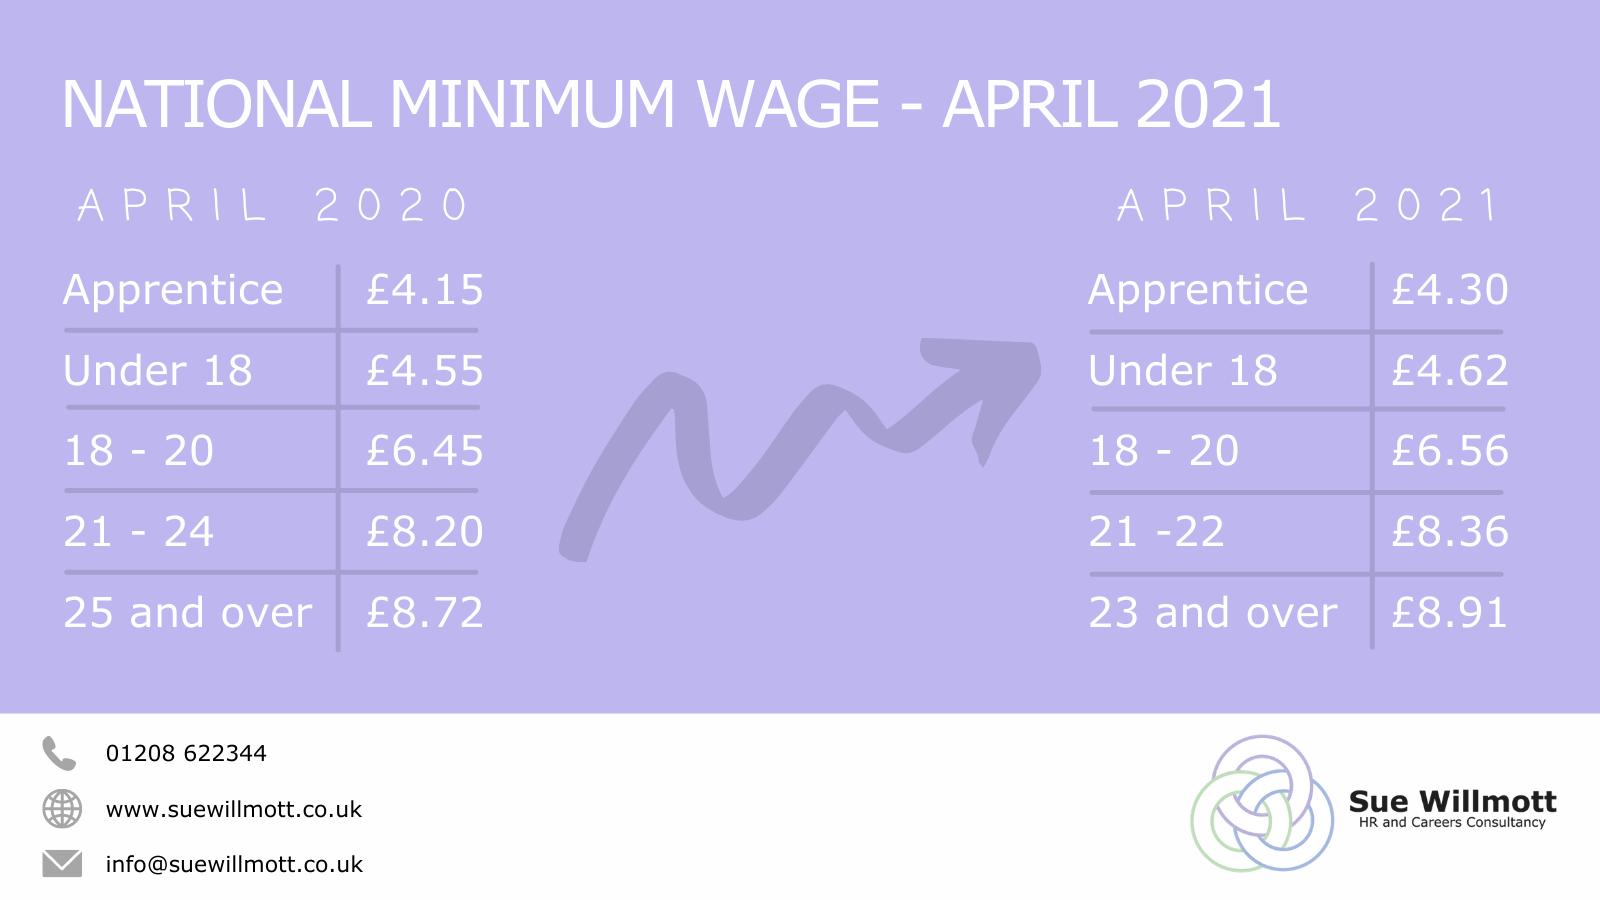 National Minimum Wage April 2020